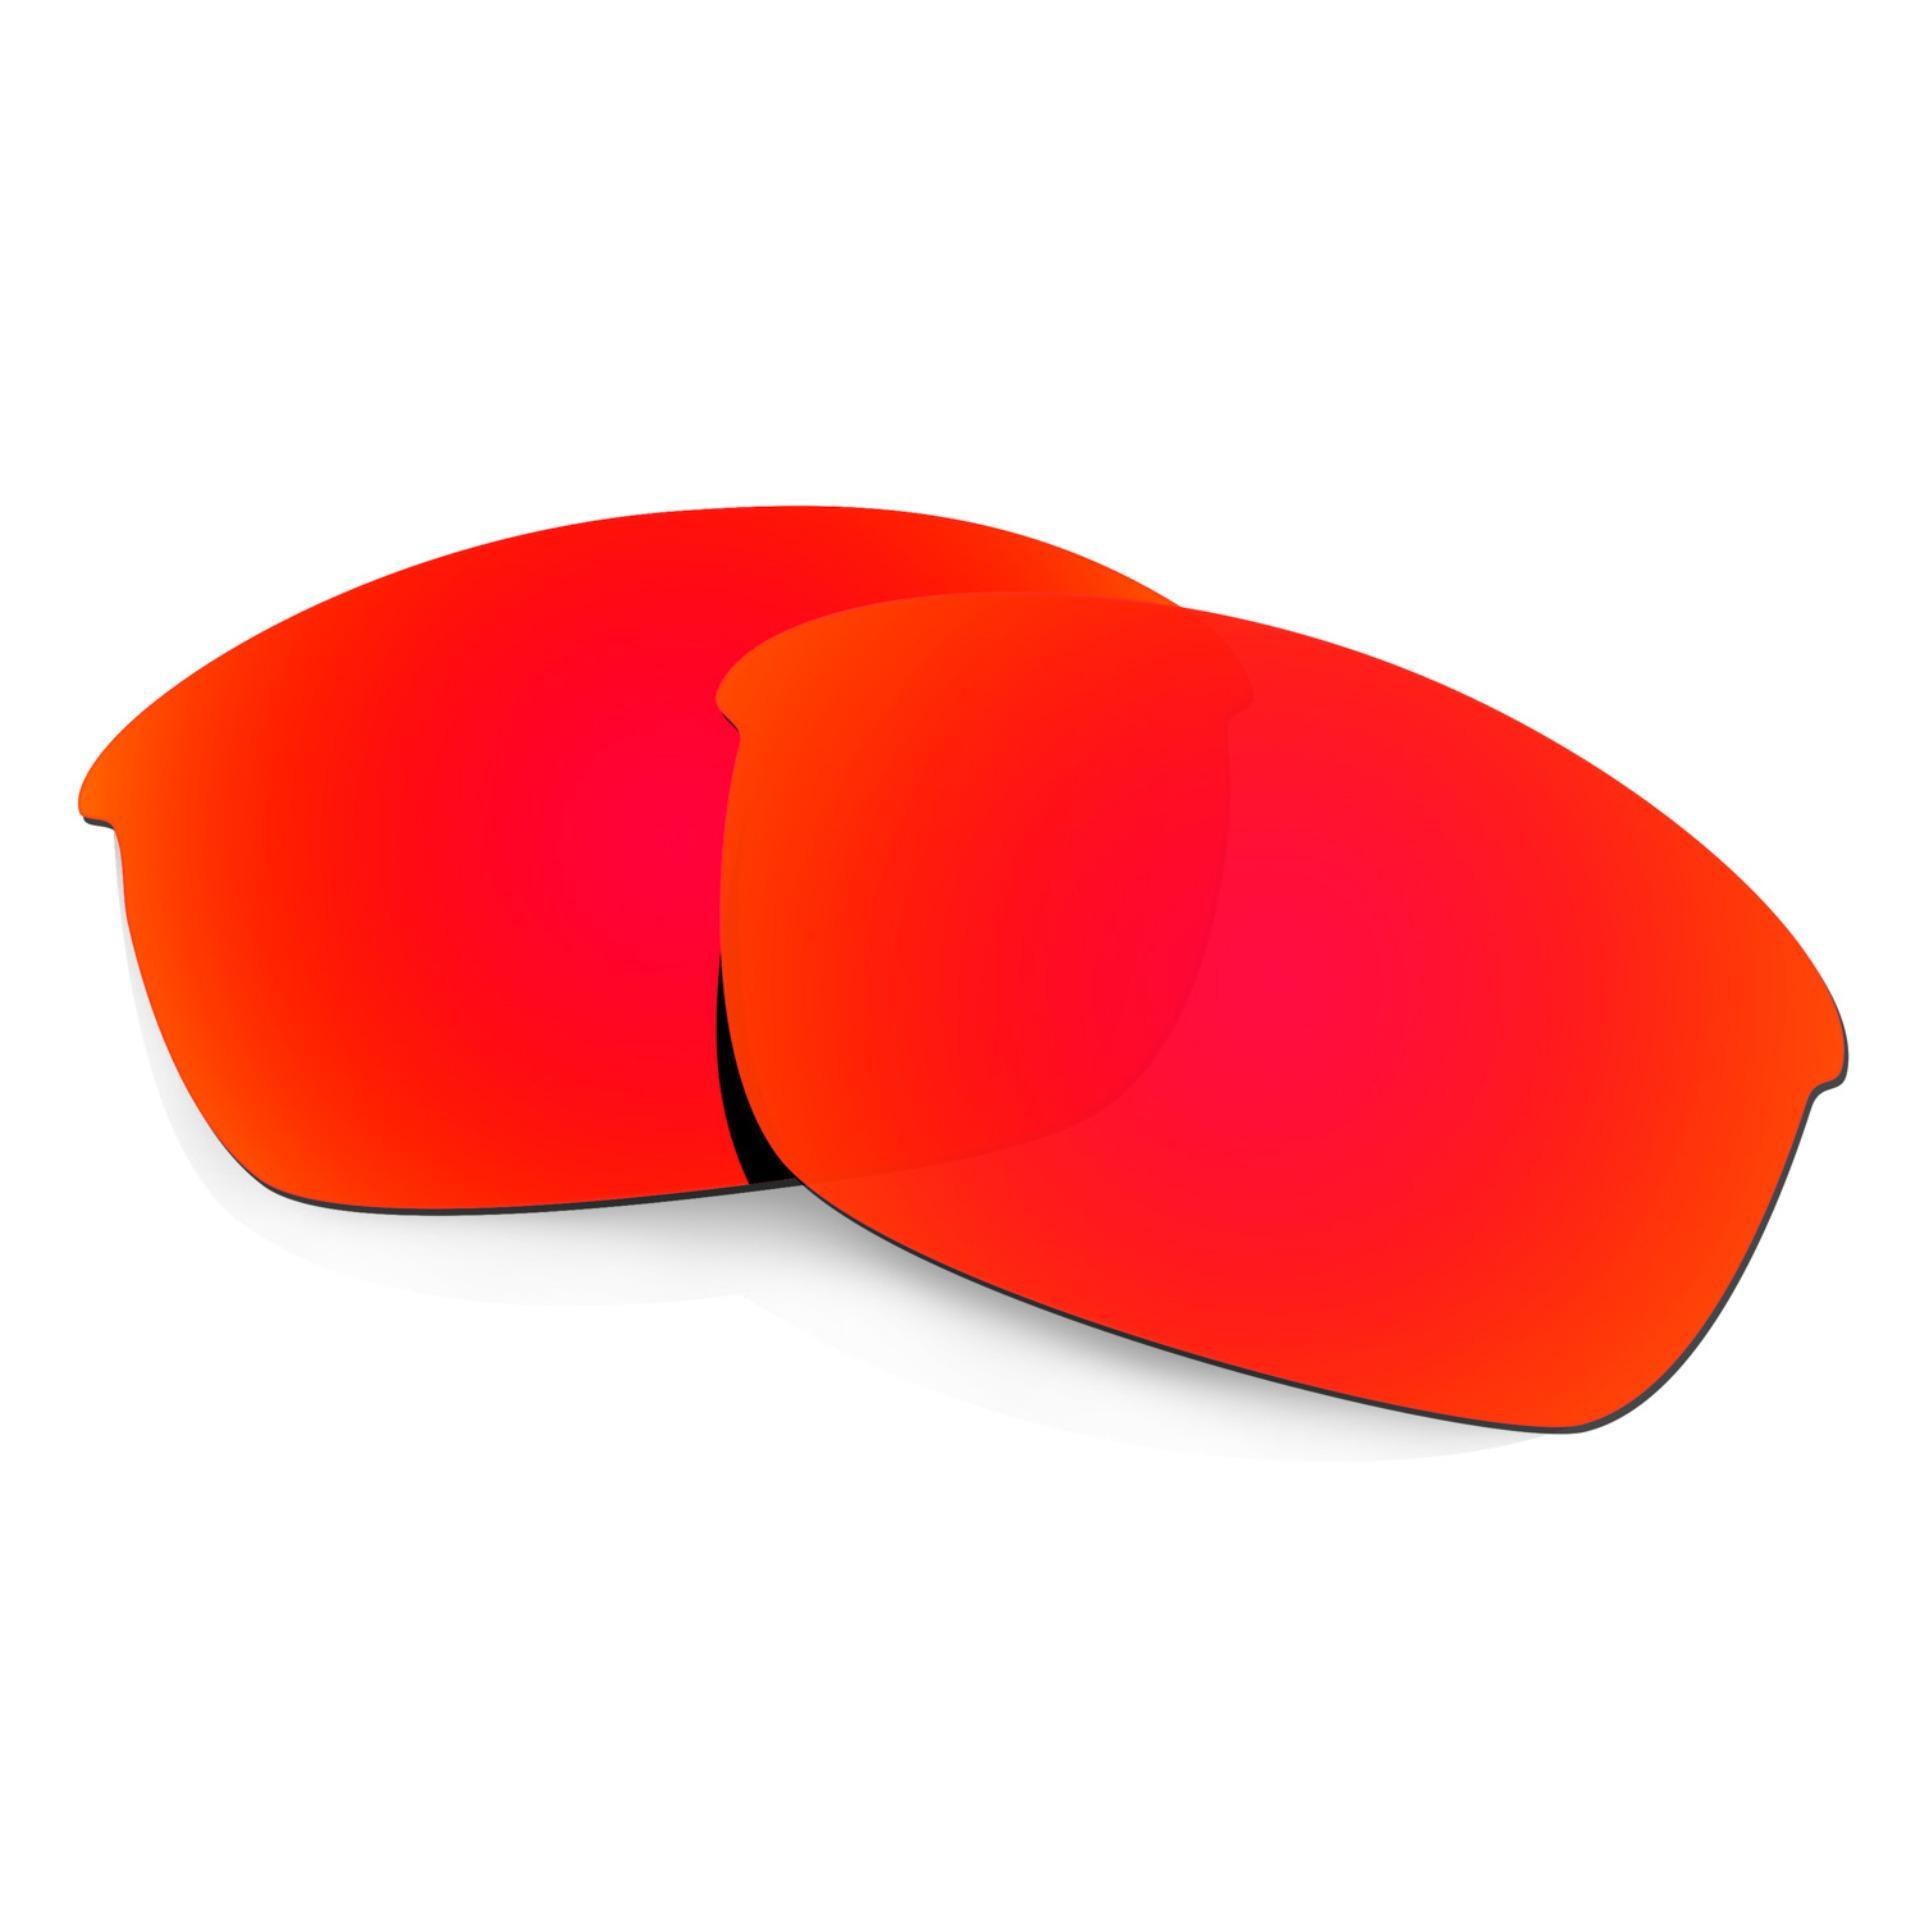 153af8e987a96 HKUCO Mens Polarized Replacement Lenses for Model Flak Jacket Sunglasses  Red Lenses - intl